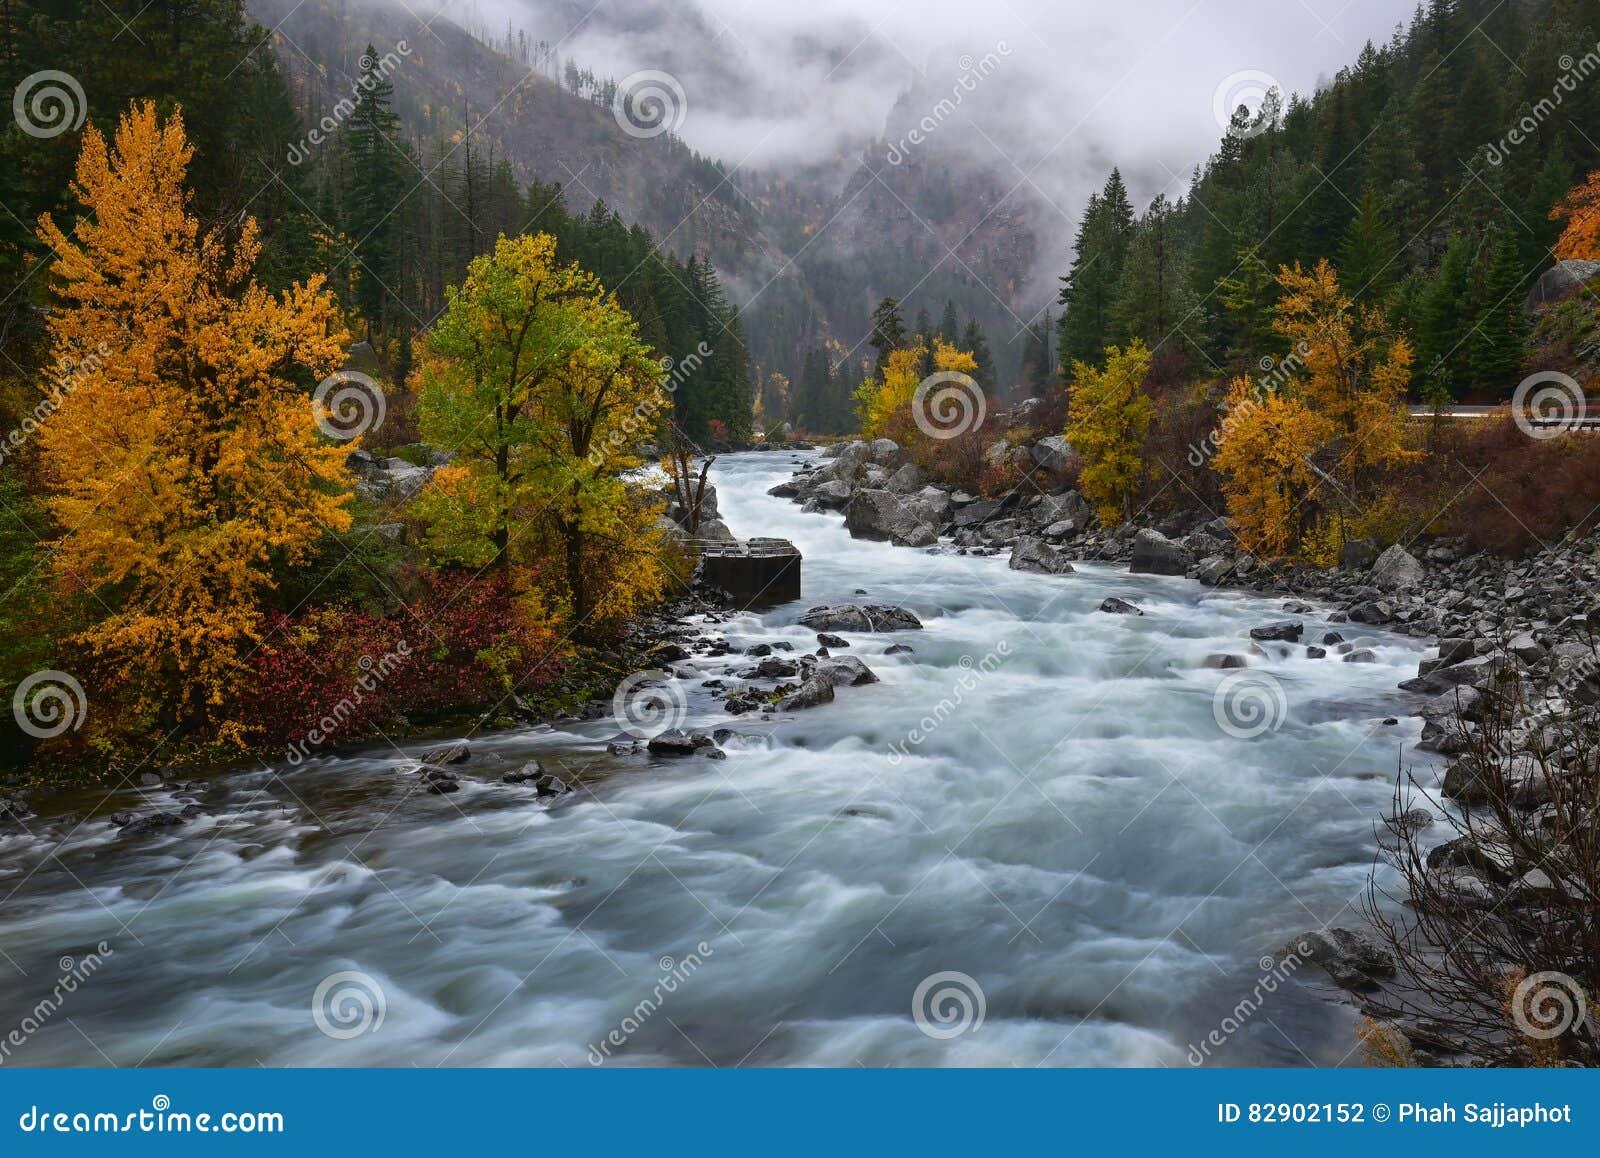 Fluxo do rio em Leavenworth, Washington